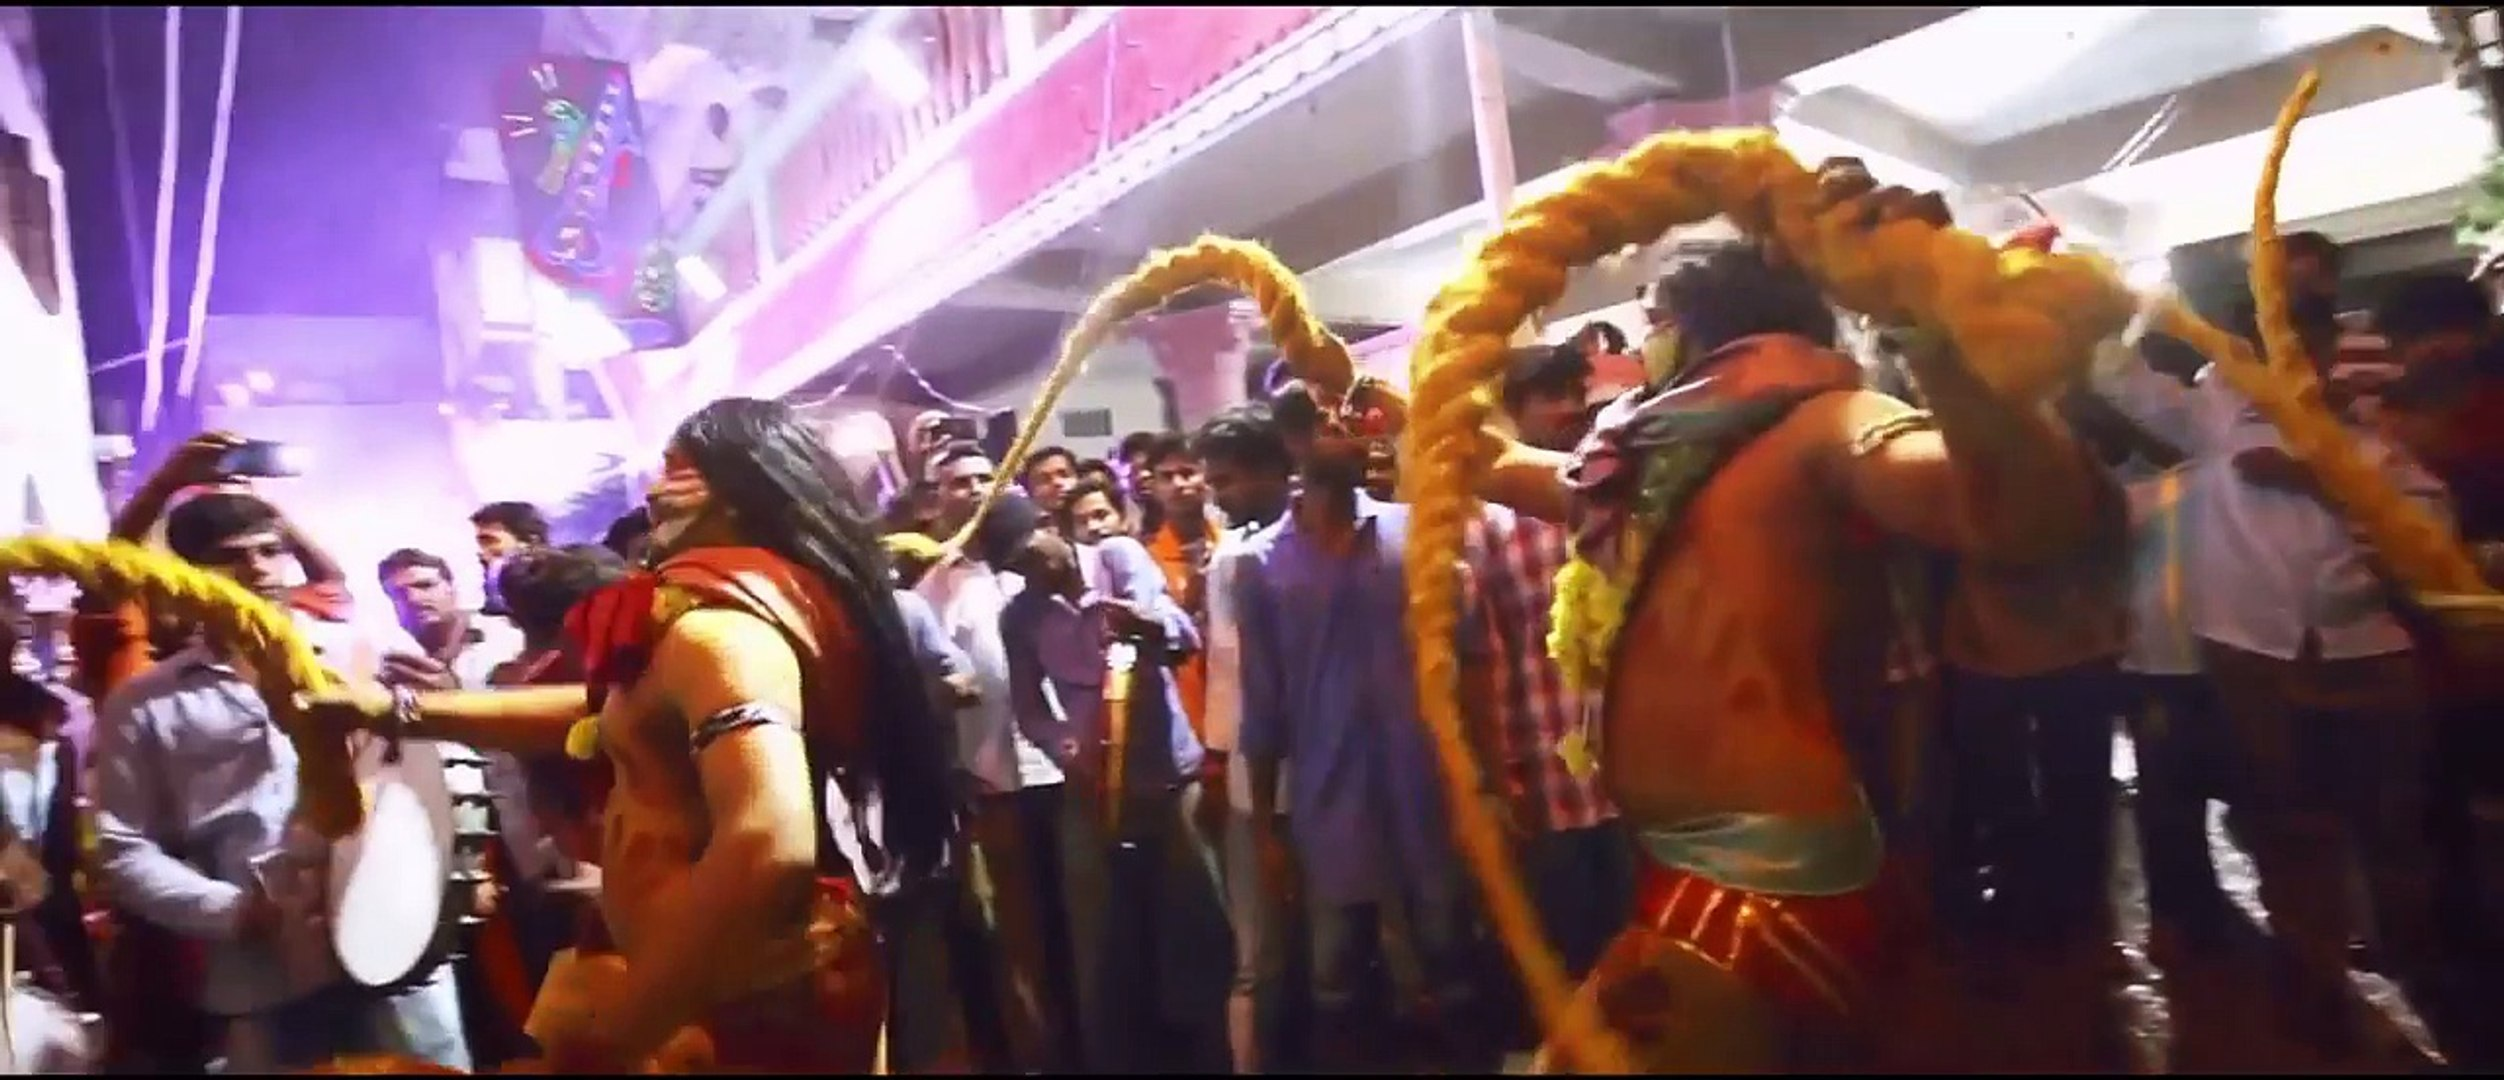 Undha Ledha Trailer || Undha Ledha  Theatrical Trailer || Telugu Movie Trailer || 5n media